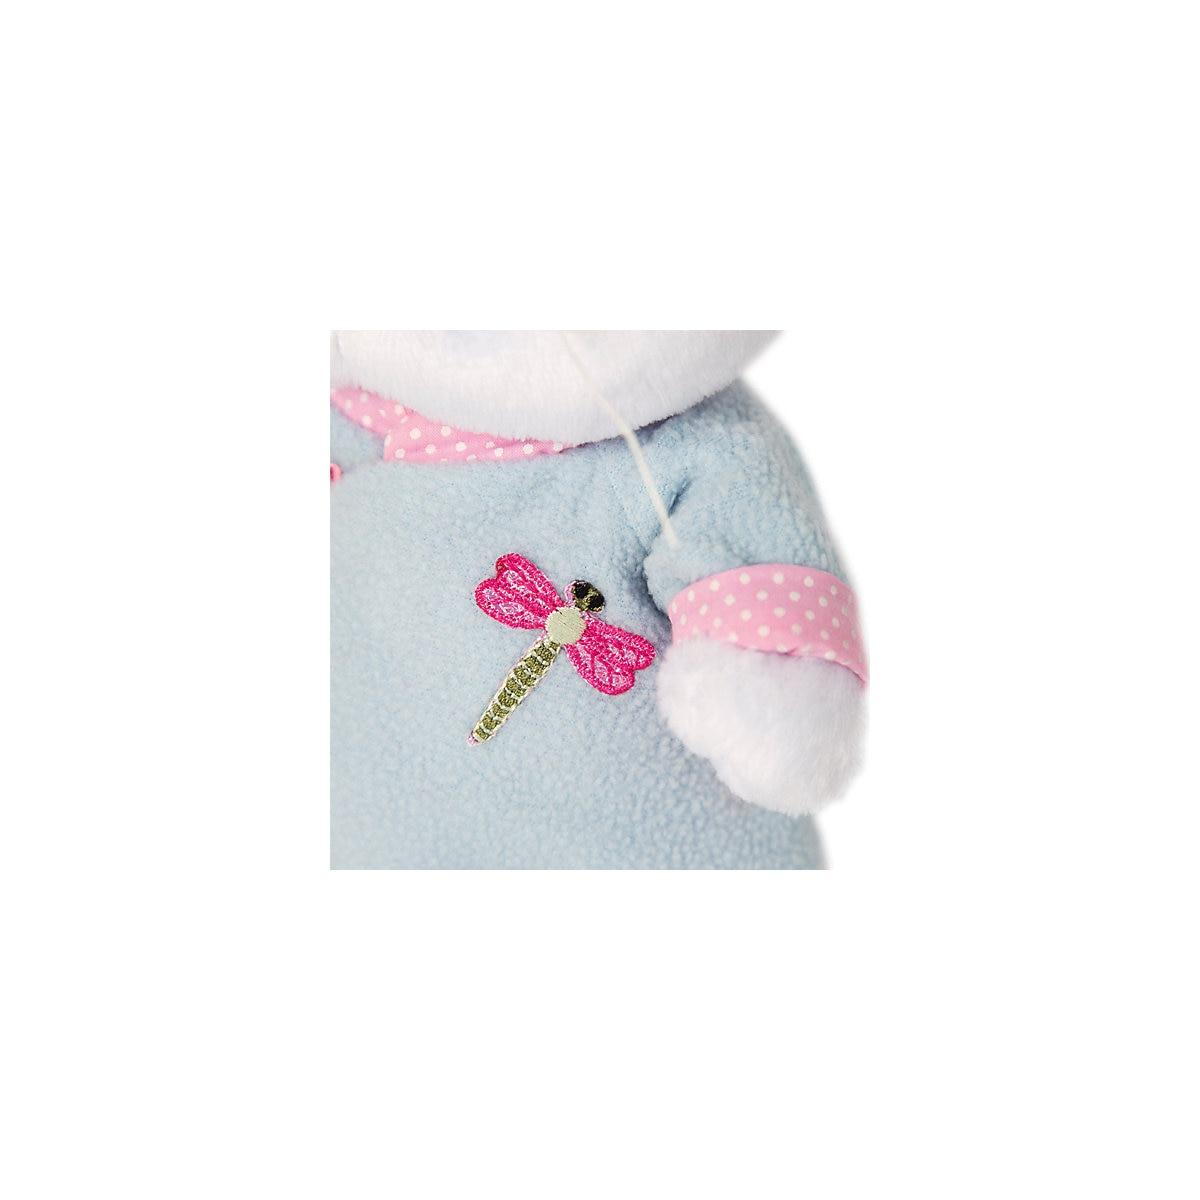 Gevulde & Pluche Dieren BUDI BASA 8999611 Stitch Beer Totoro Giraffe Fox Kat Hond Zachte Kinderen \'s speelgoed MTpromo - 3